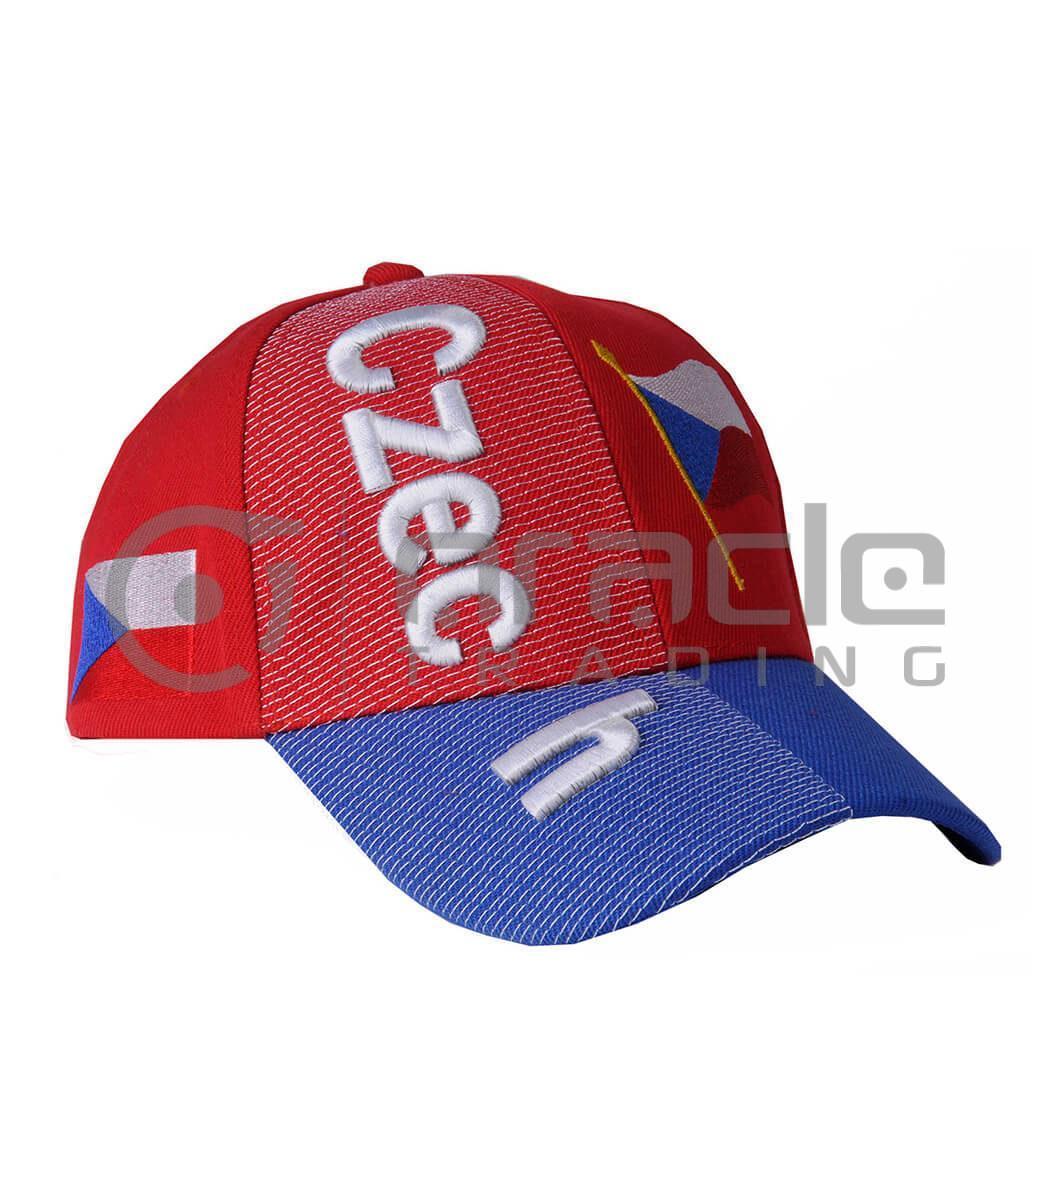 3D Czech Republic Hat